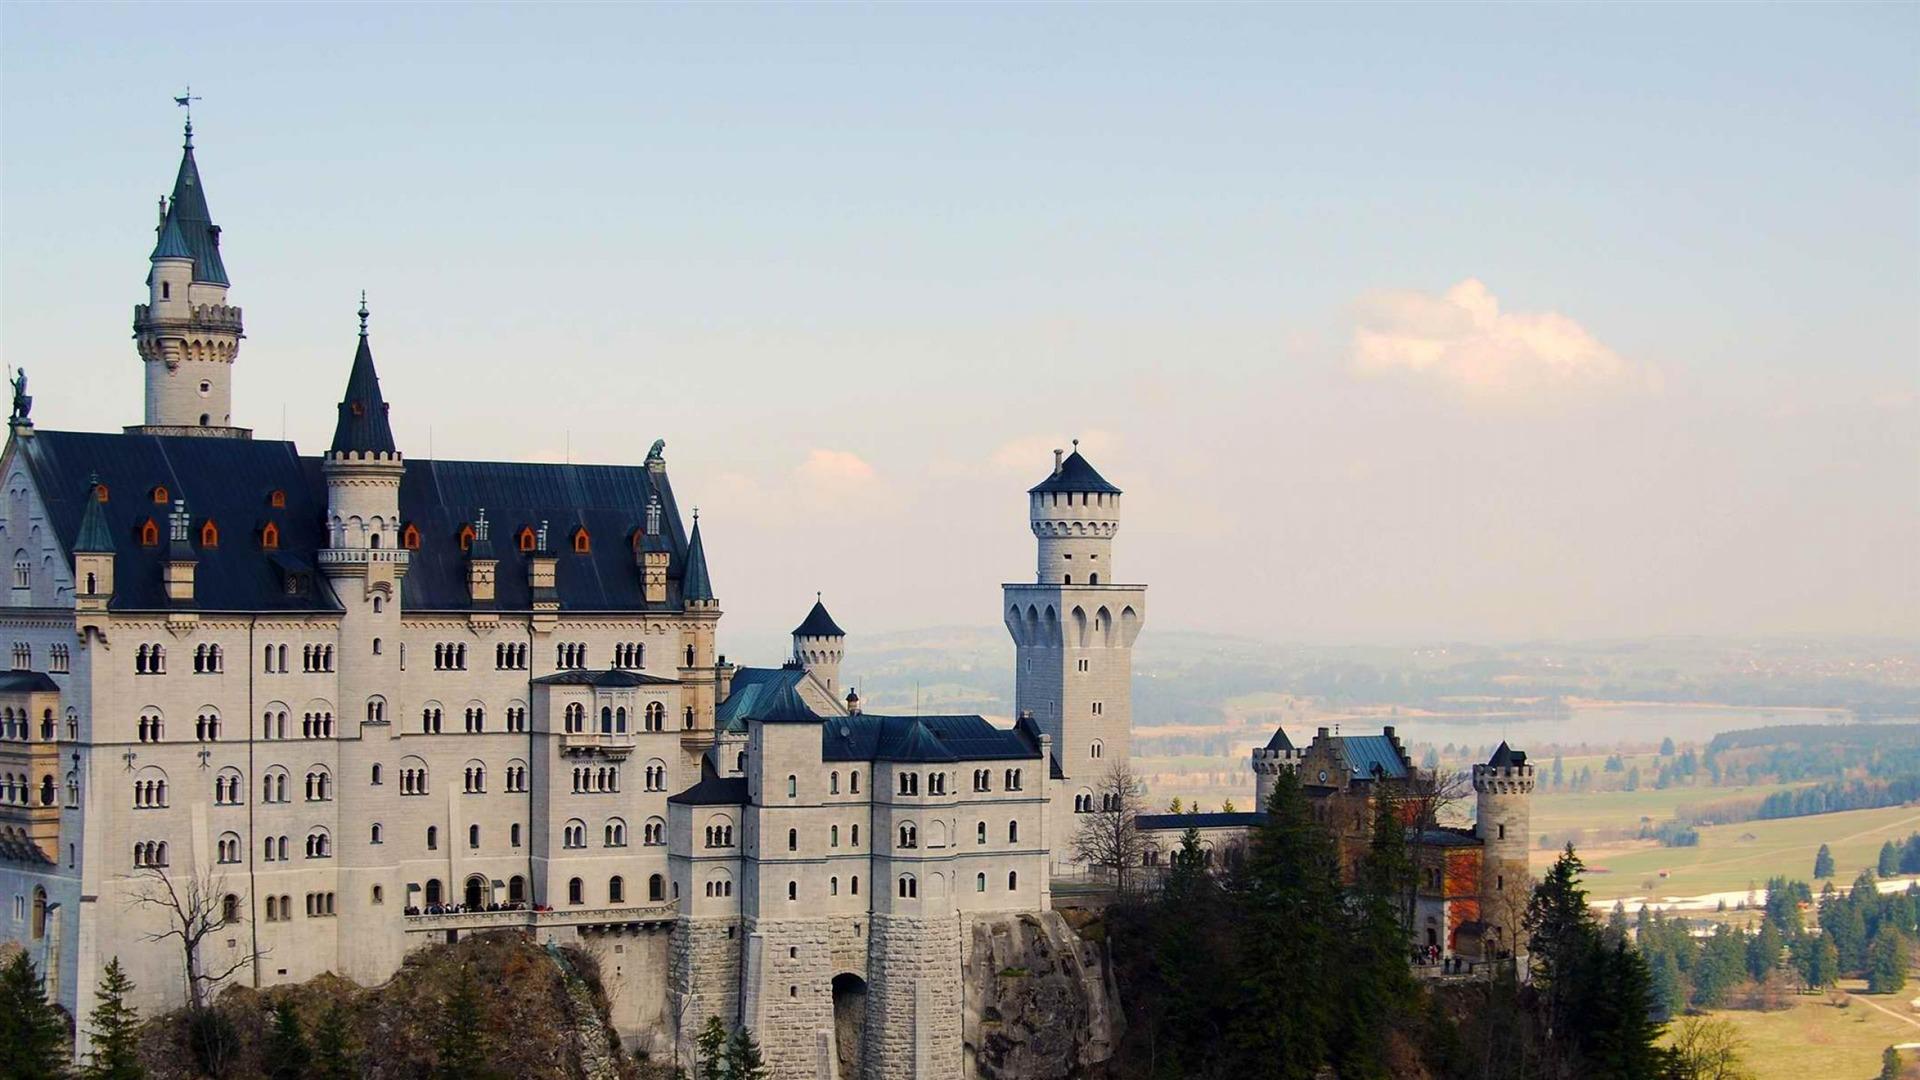 Castle Germany City Architecture Wallpaper 1920x1080jpg